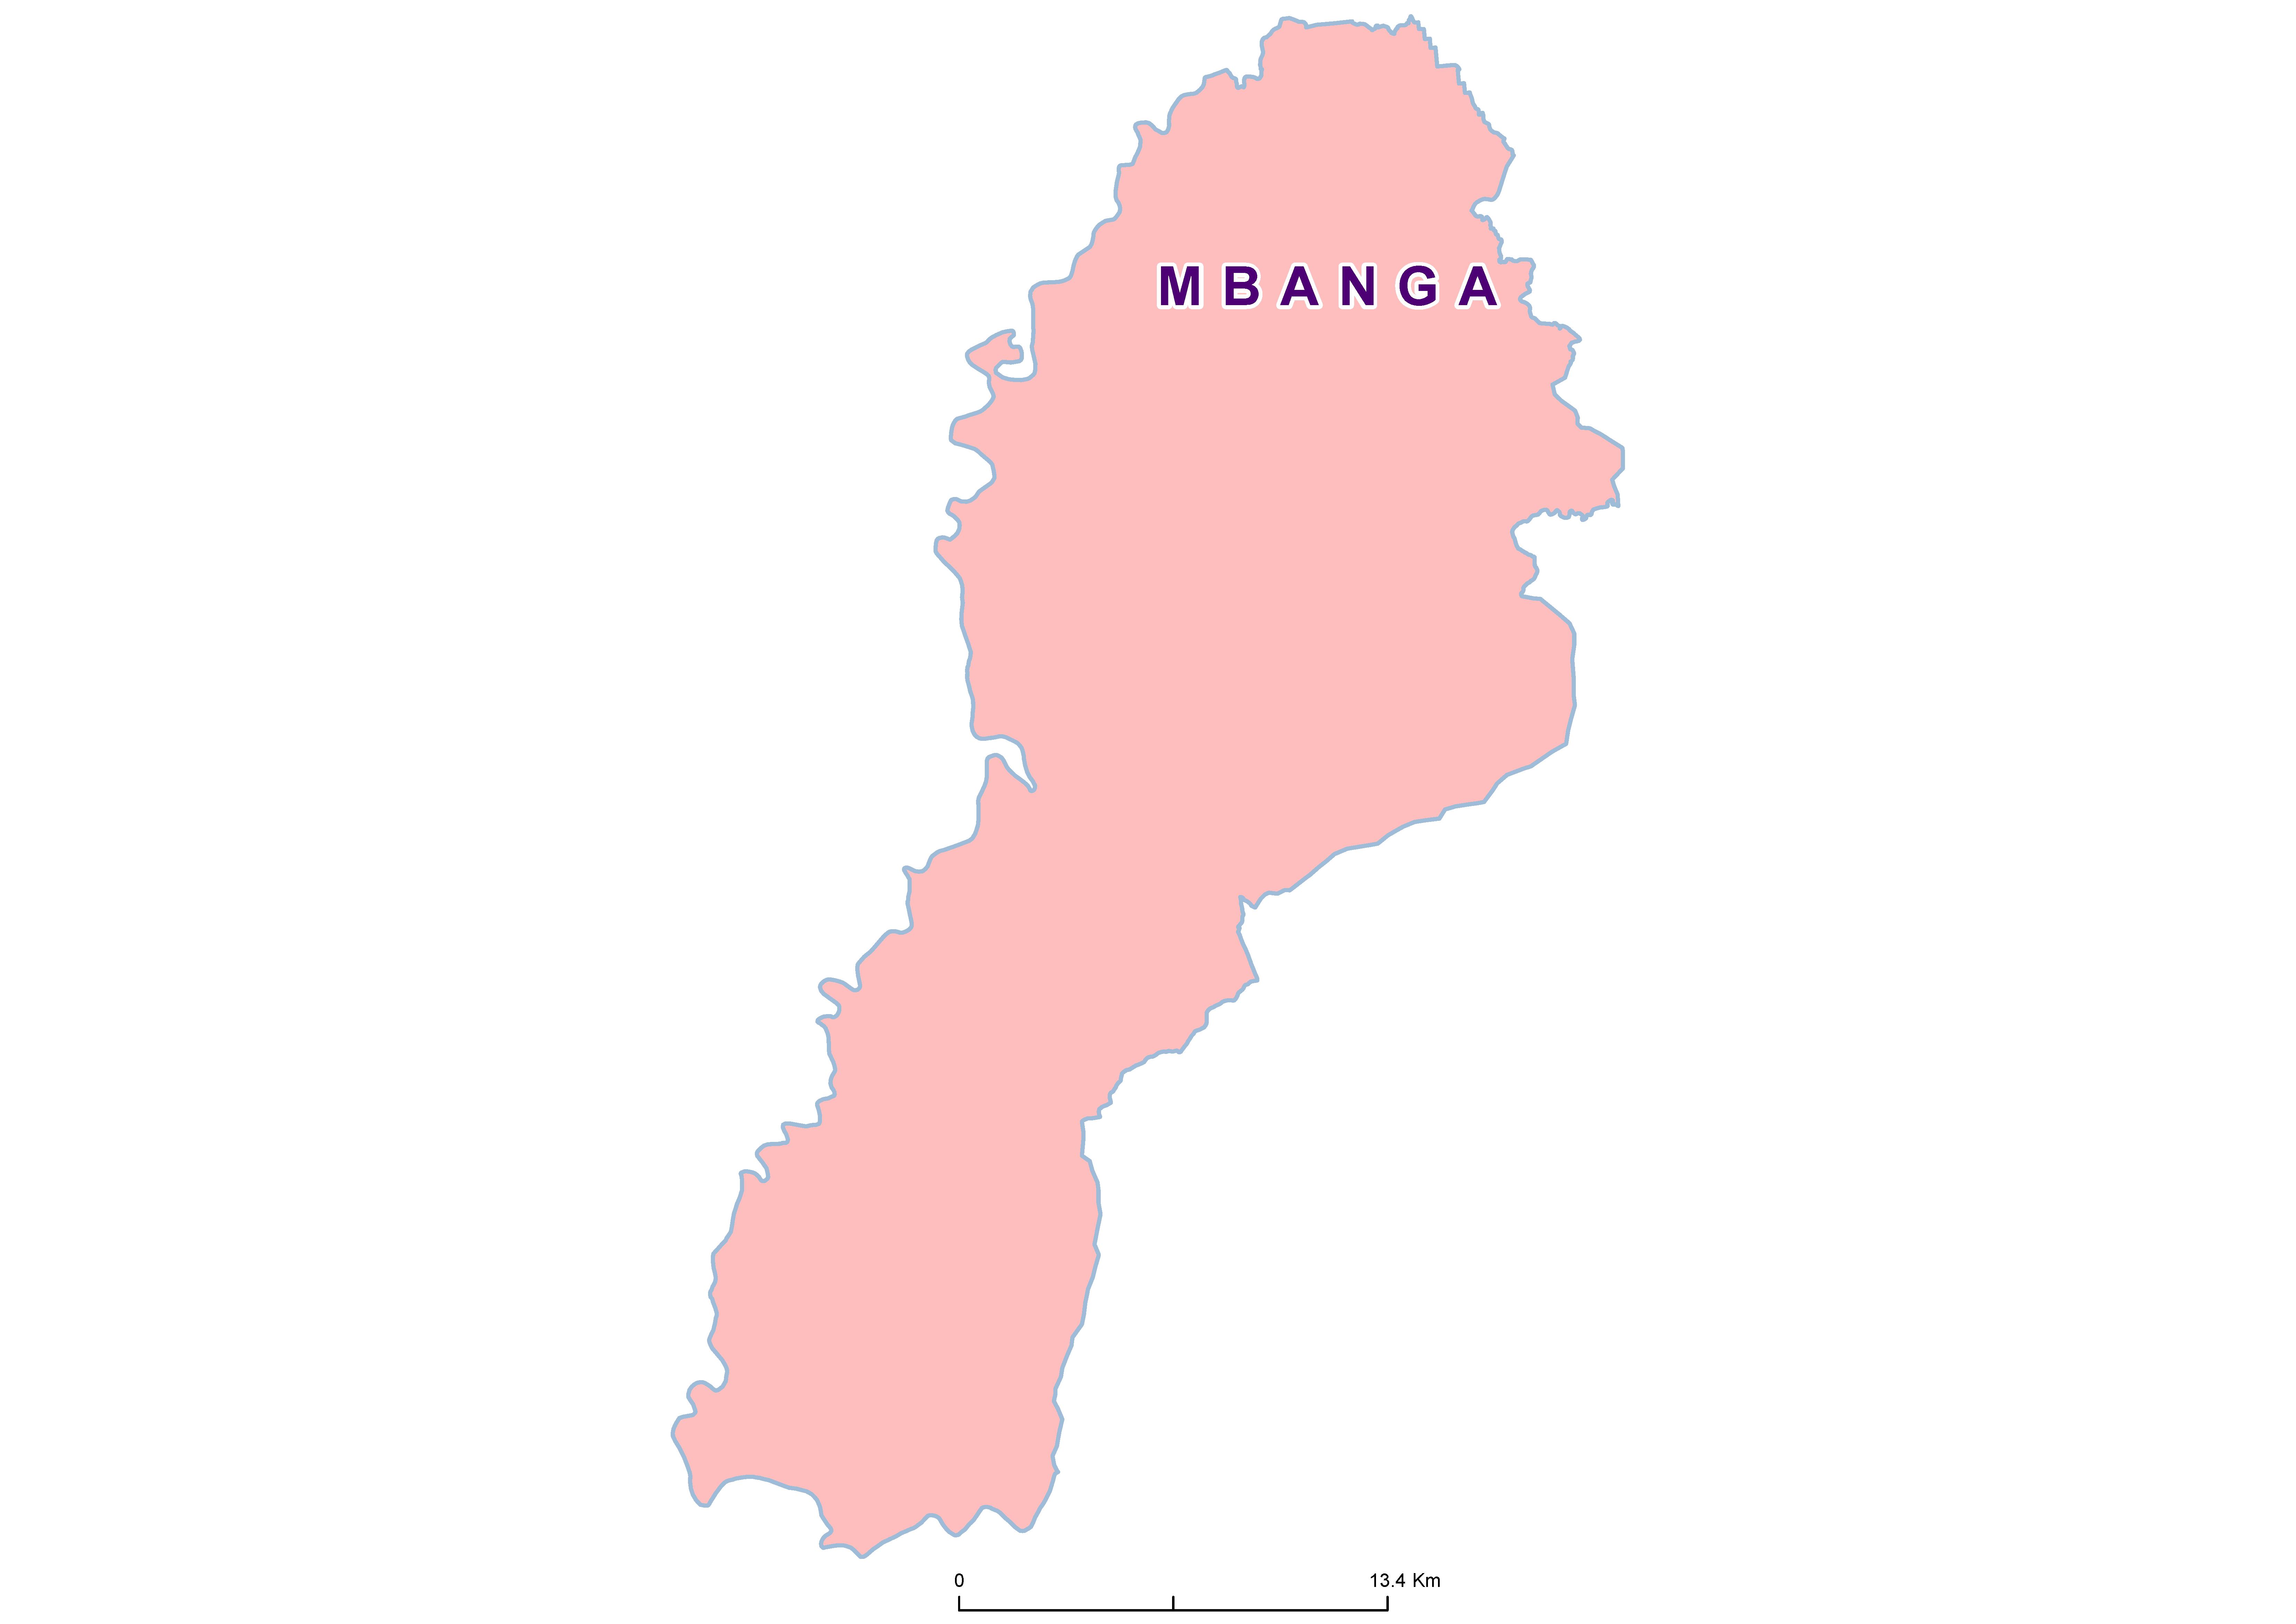 Mbanga Mean SCH 19850001